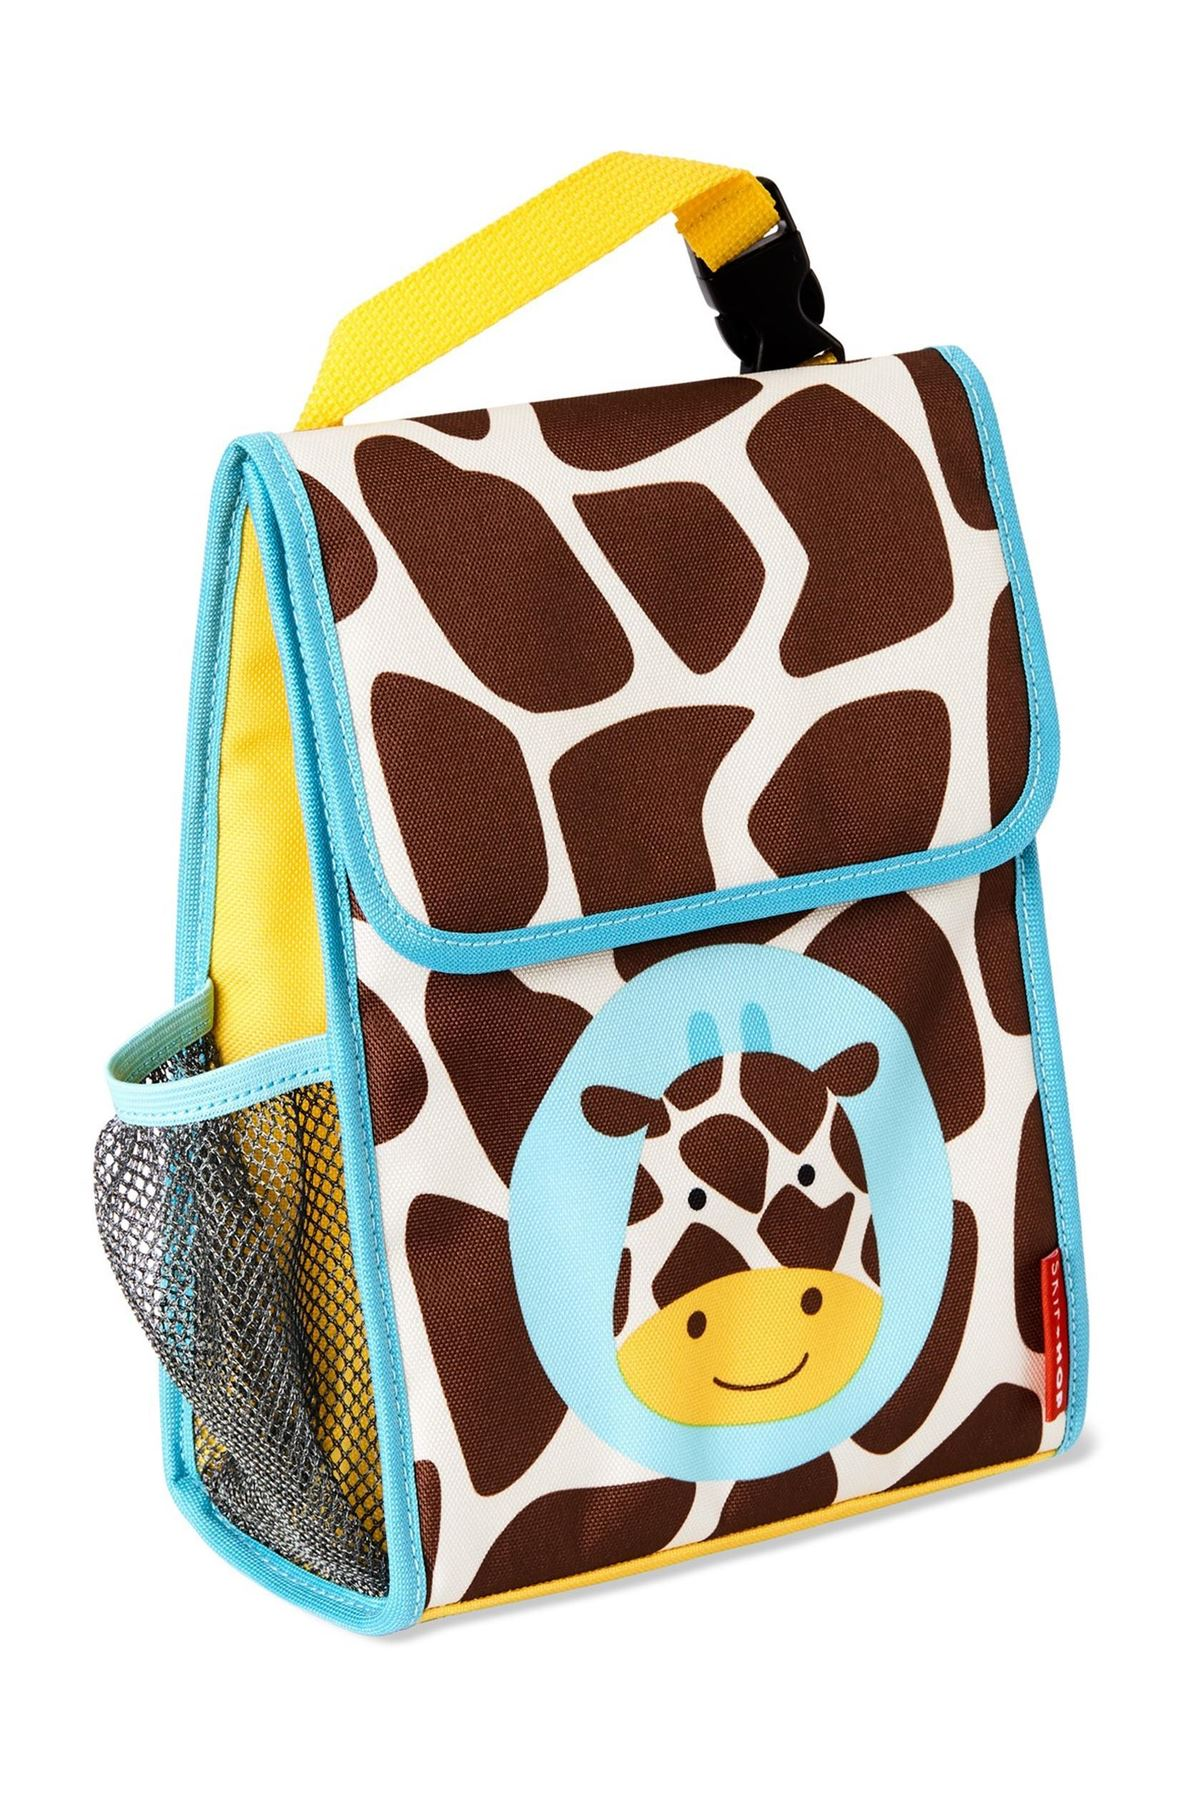 Skip Hop Zoo Beslenme Çantası Zürafa